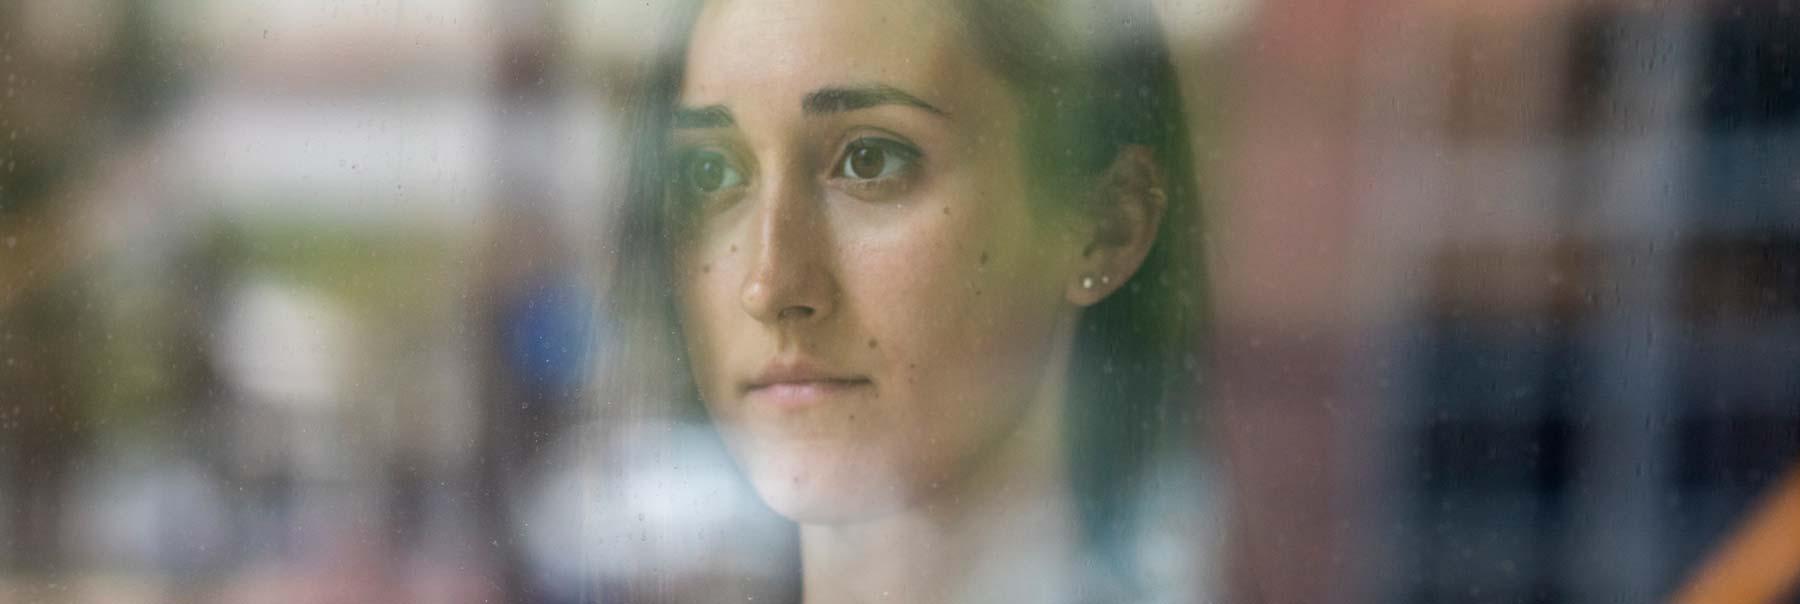 Stefanie Zavodny looking out a window